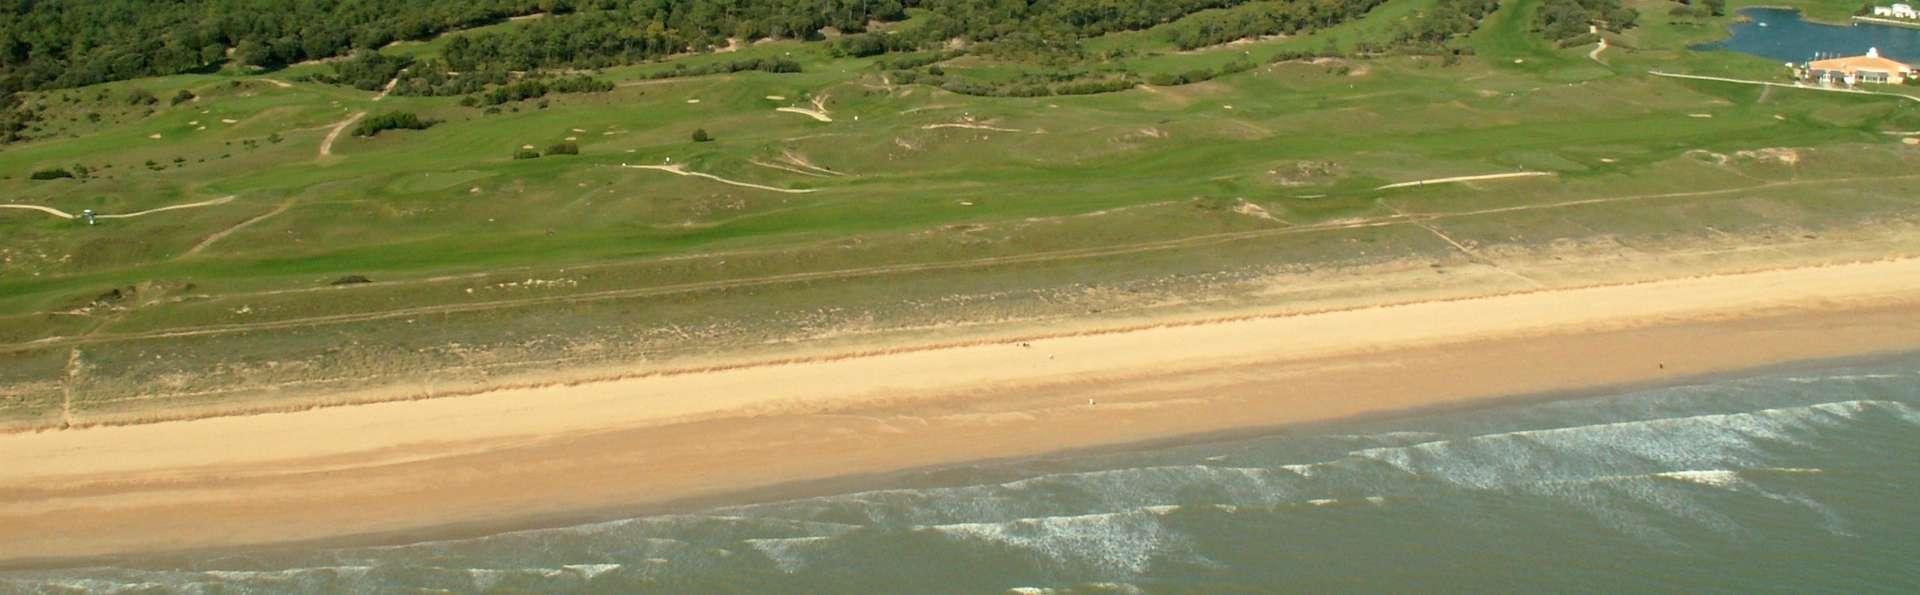 Résidence Atlantic Golf Valdys - Paysage